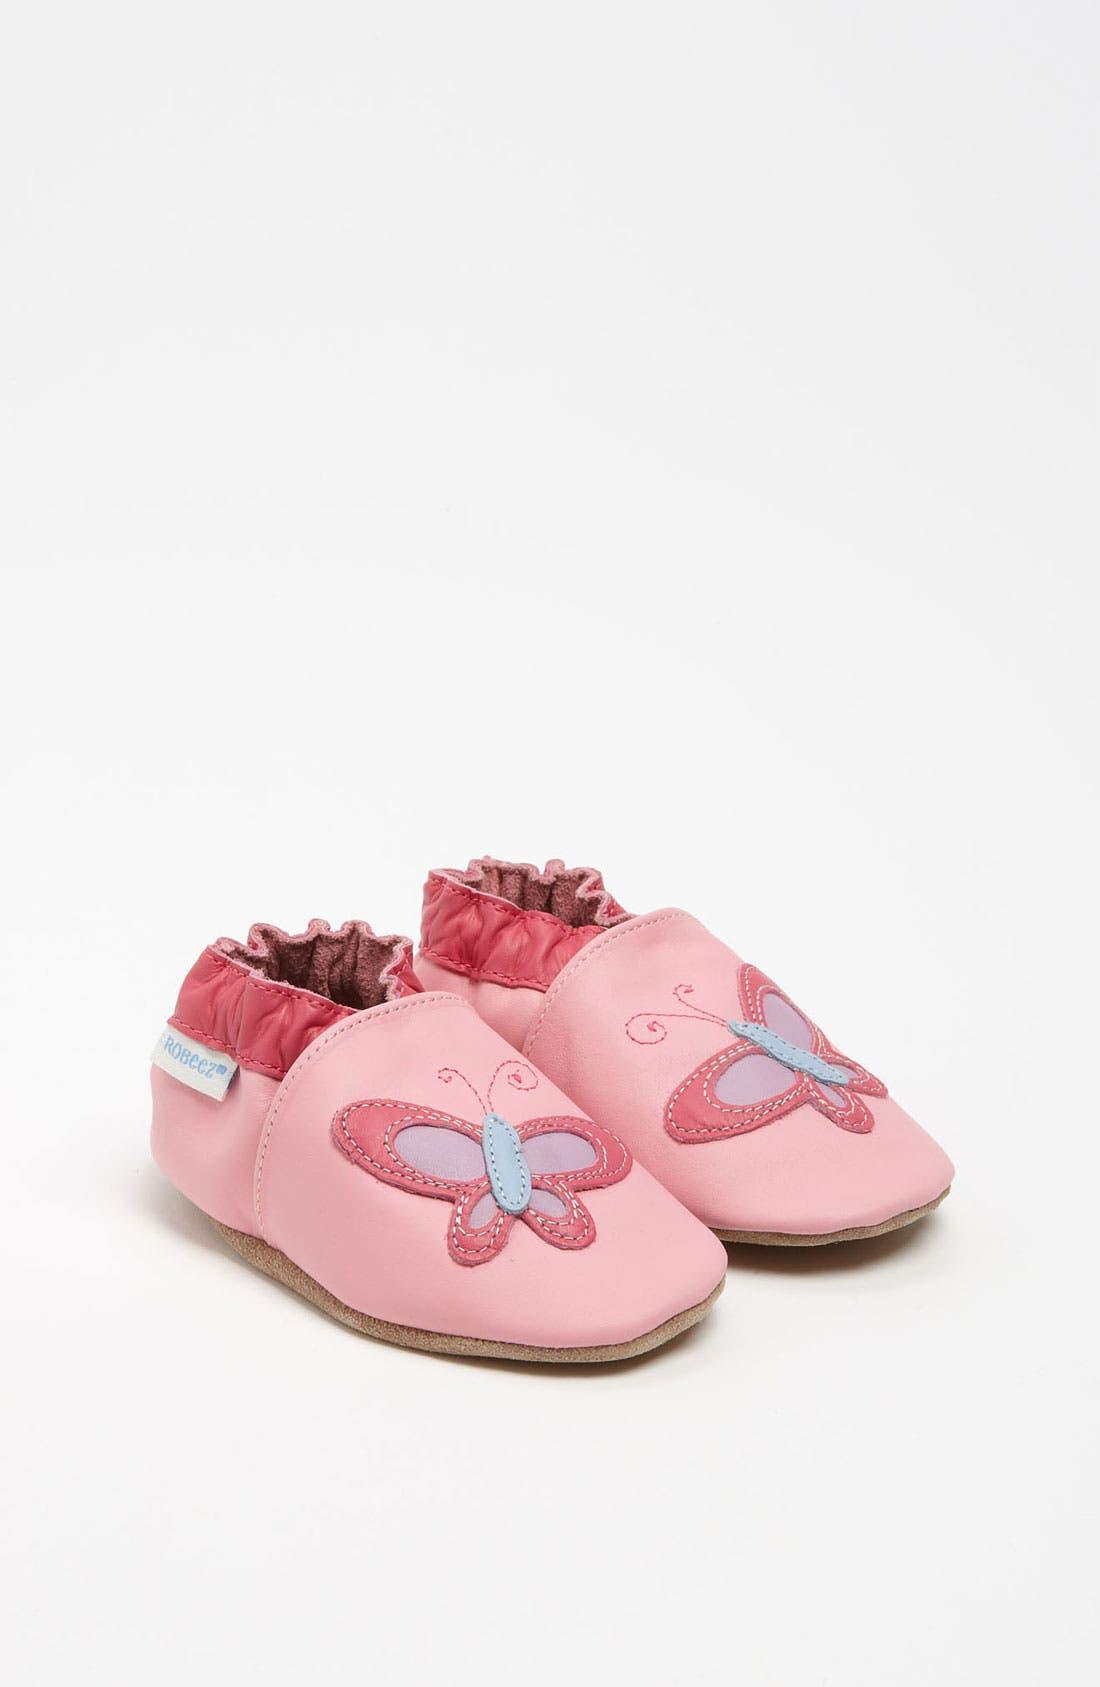 Alternate Image 1 Selected - Robeez® 'Butterfly' Slip-On (Baby & Walker)